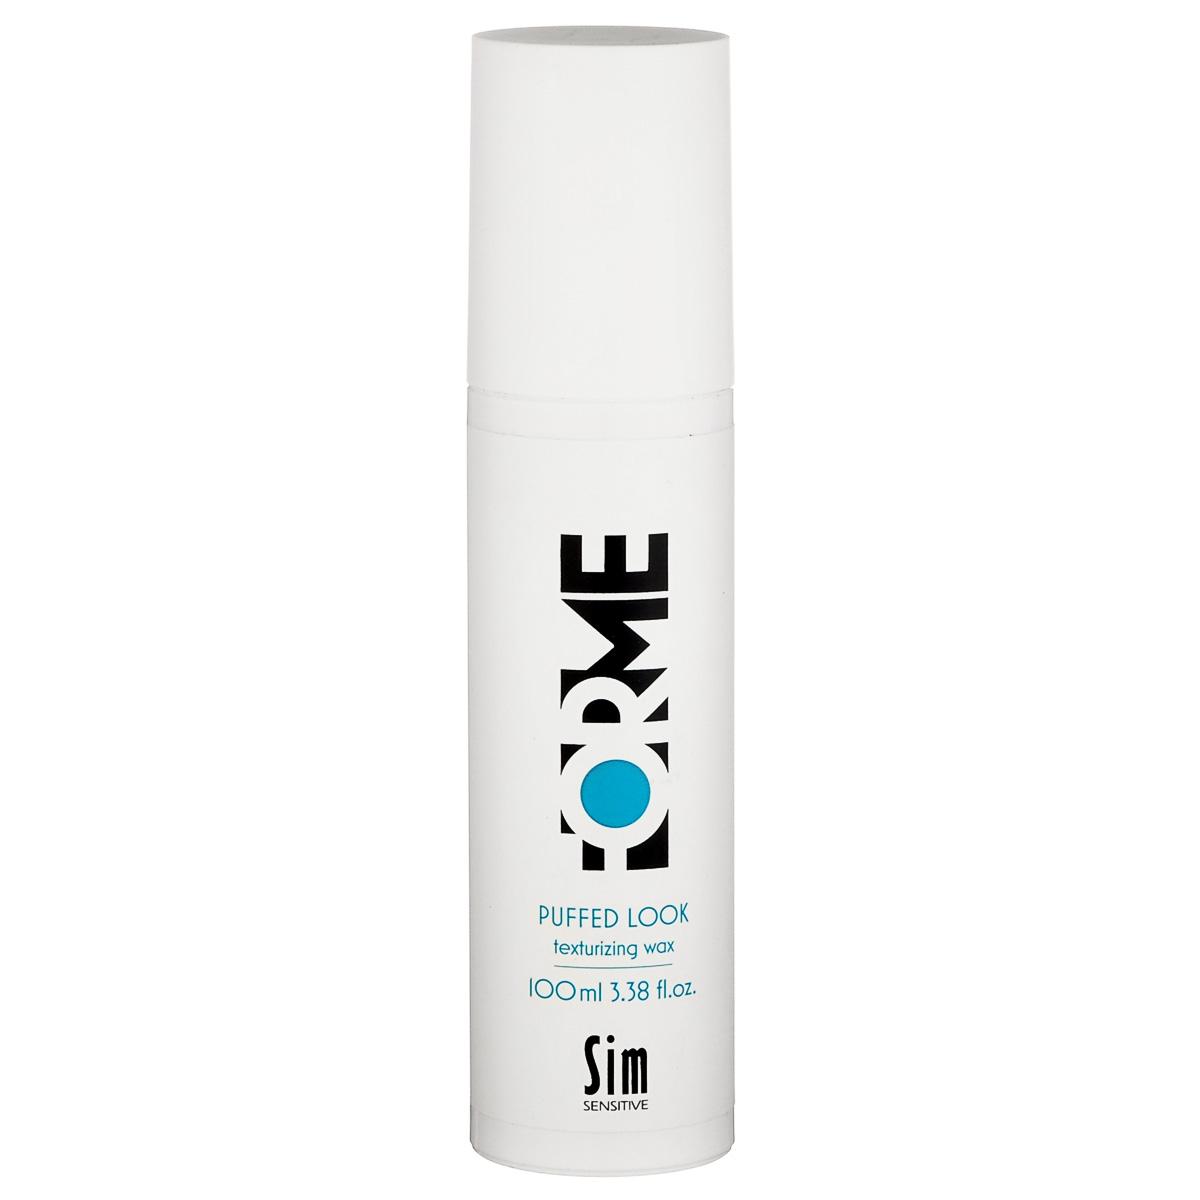 SIM SENSITIVE Текстурирующий воск для укладки волос FORME Puffed Look Texturizing Wax, 100мл